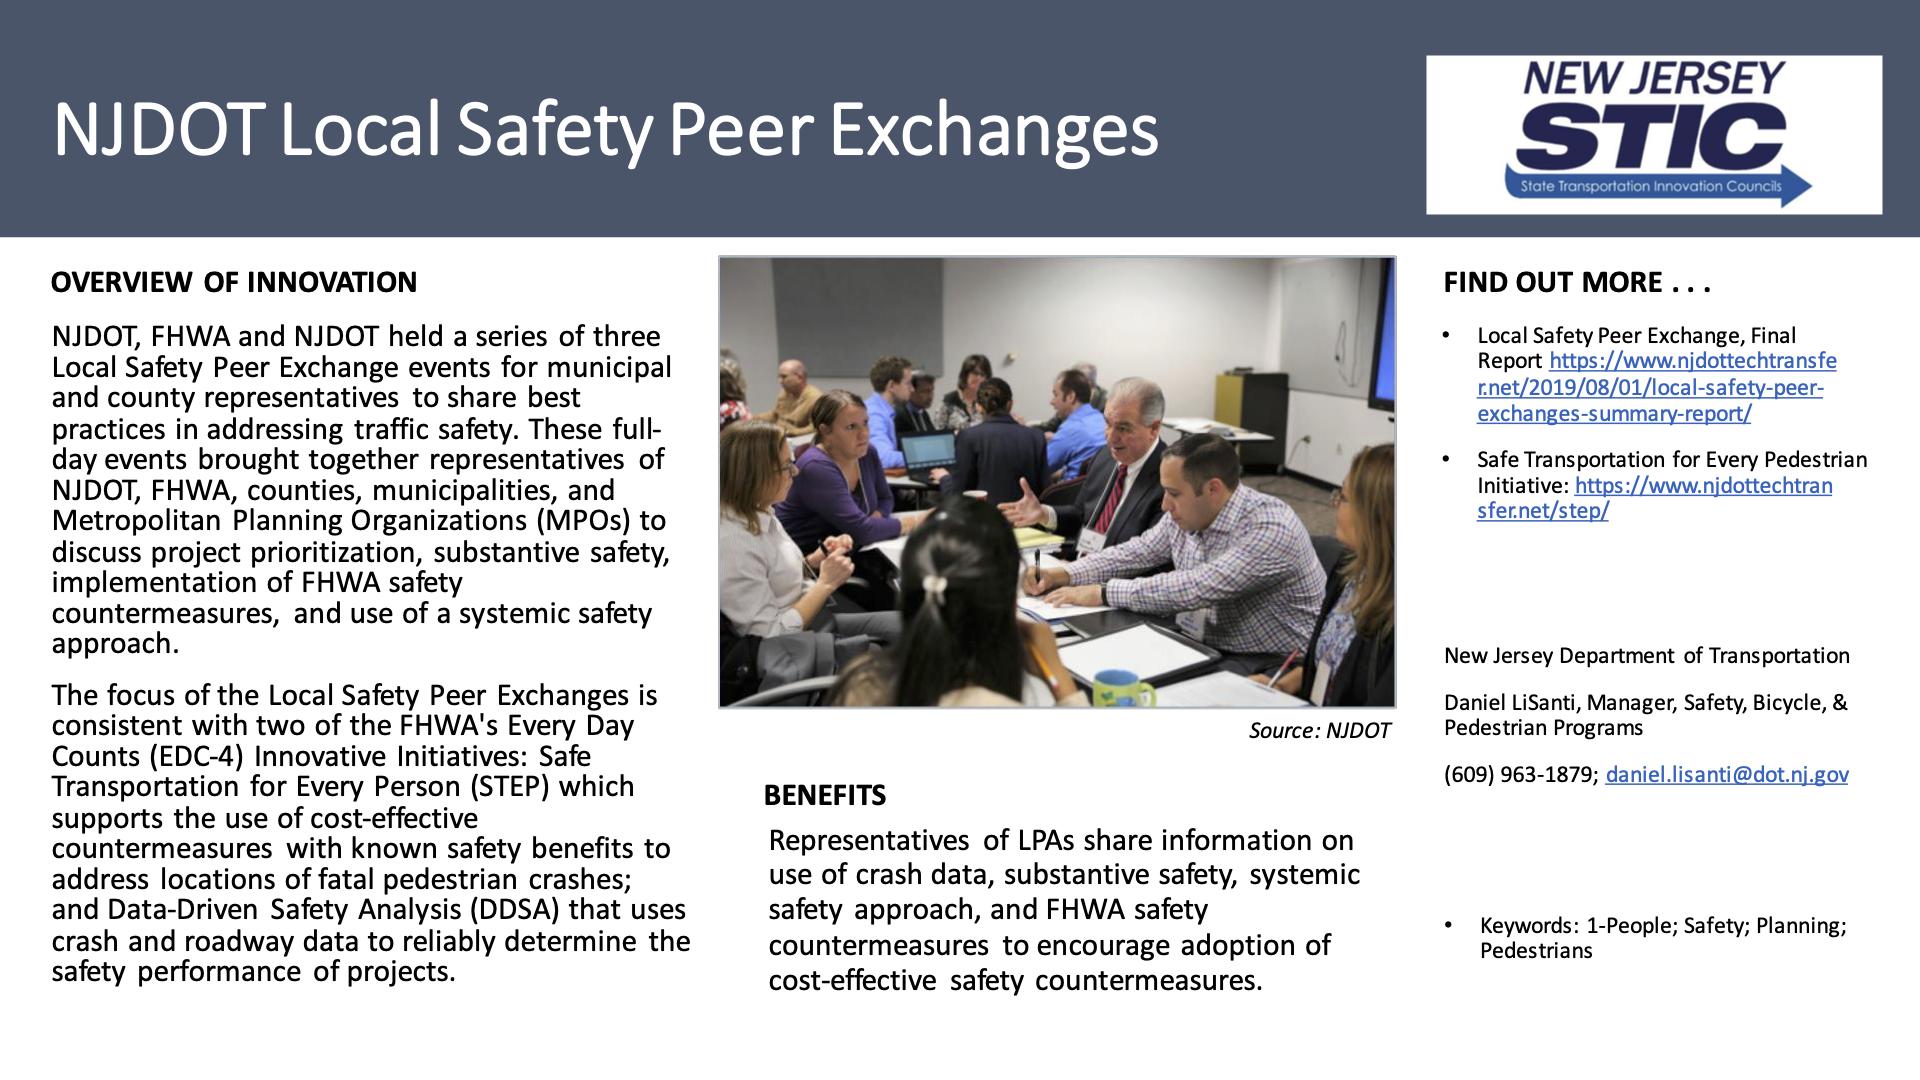 NJDOT Local Safety Peer Exchange